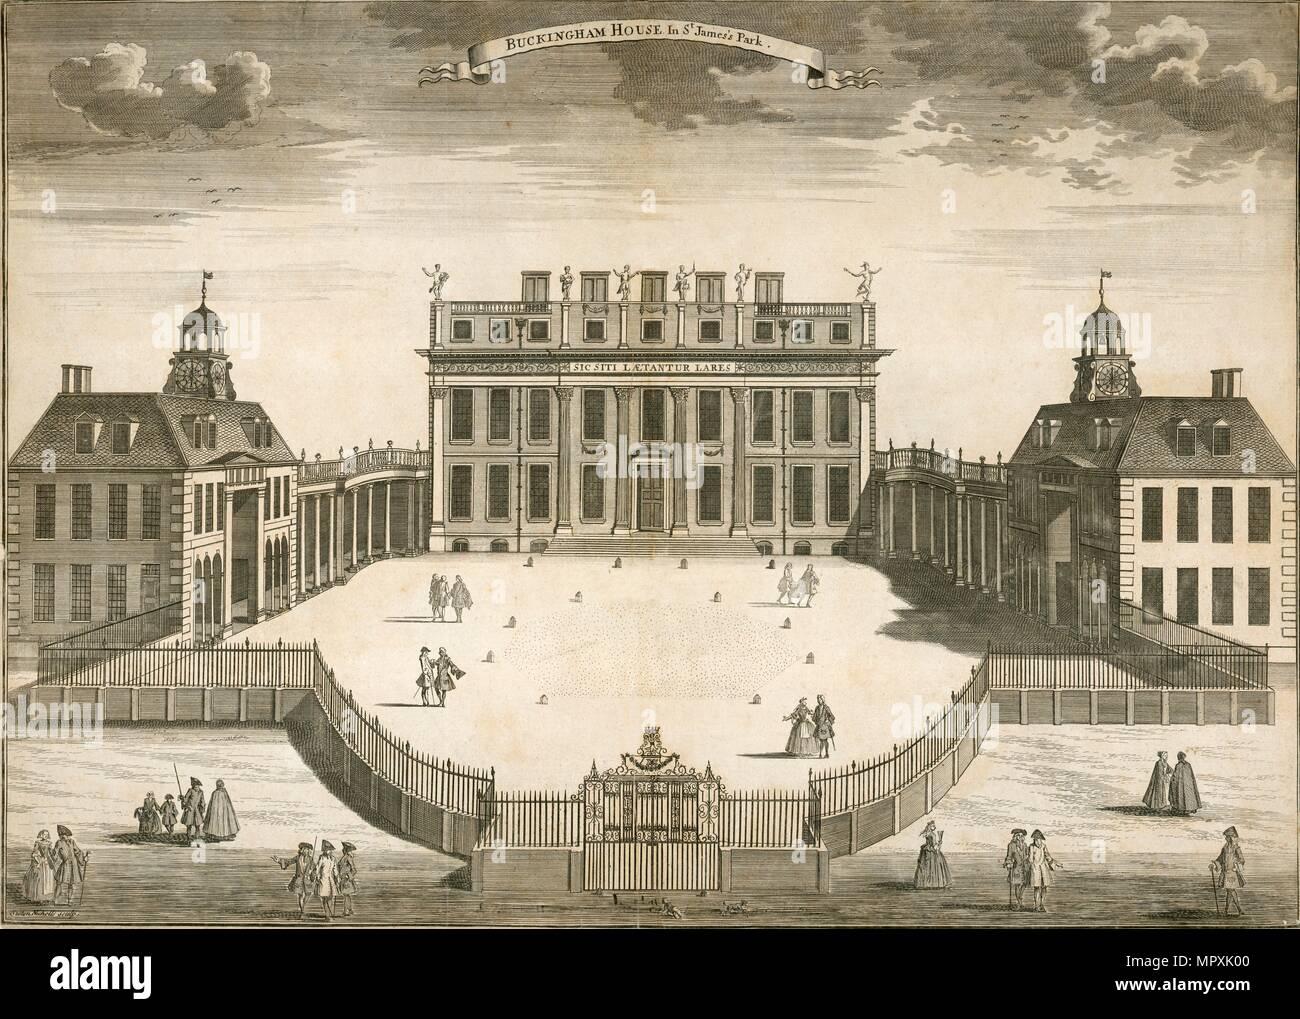 'Buckingham House in St James Park', London, 1750. Artist: Sutton Nicholls. - Stock Image